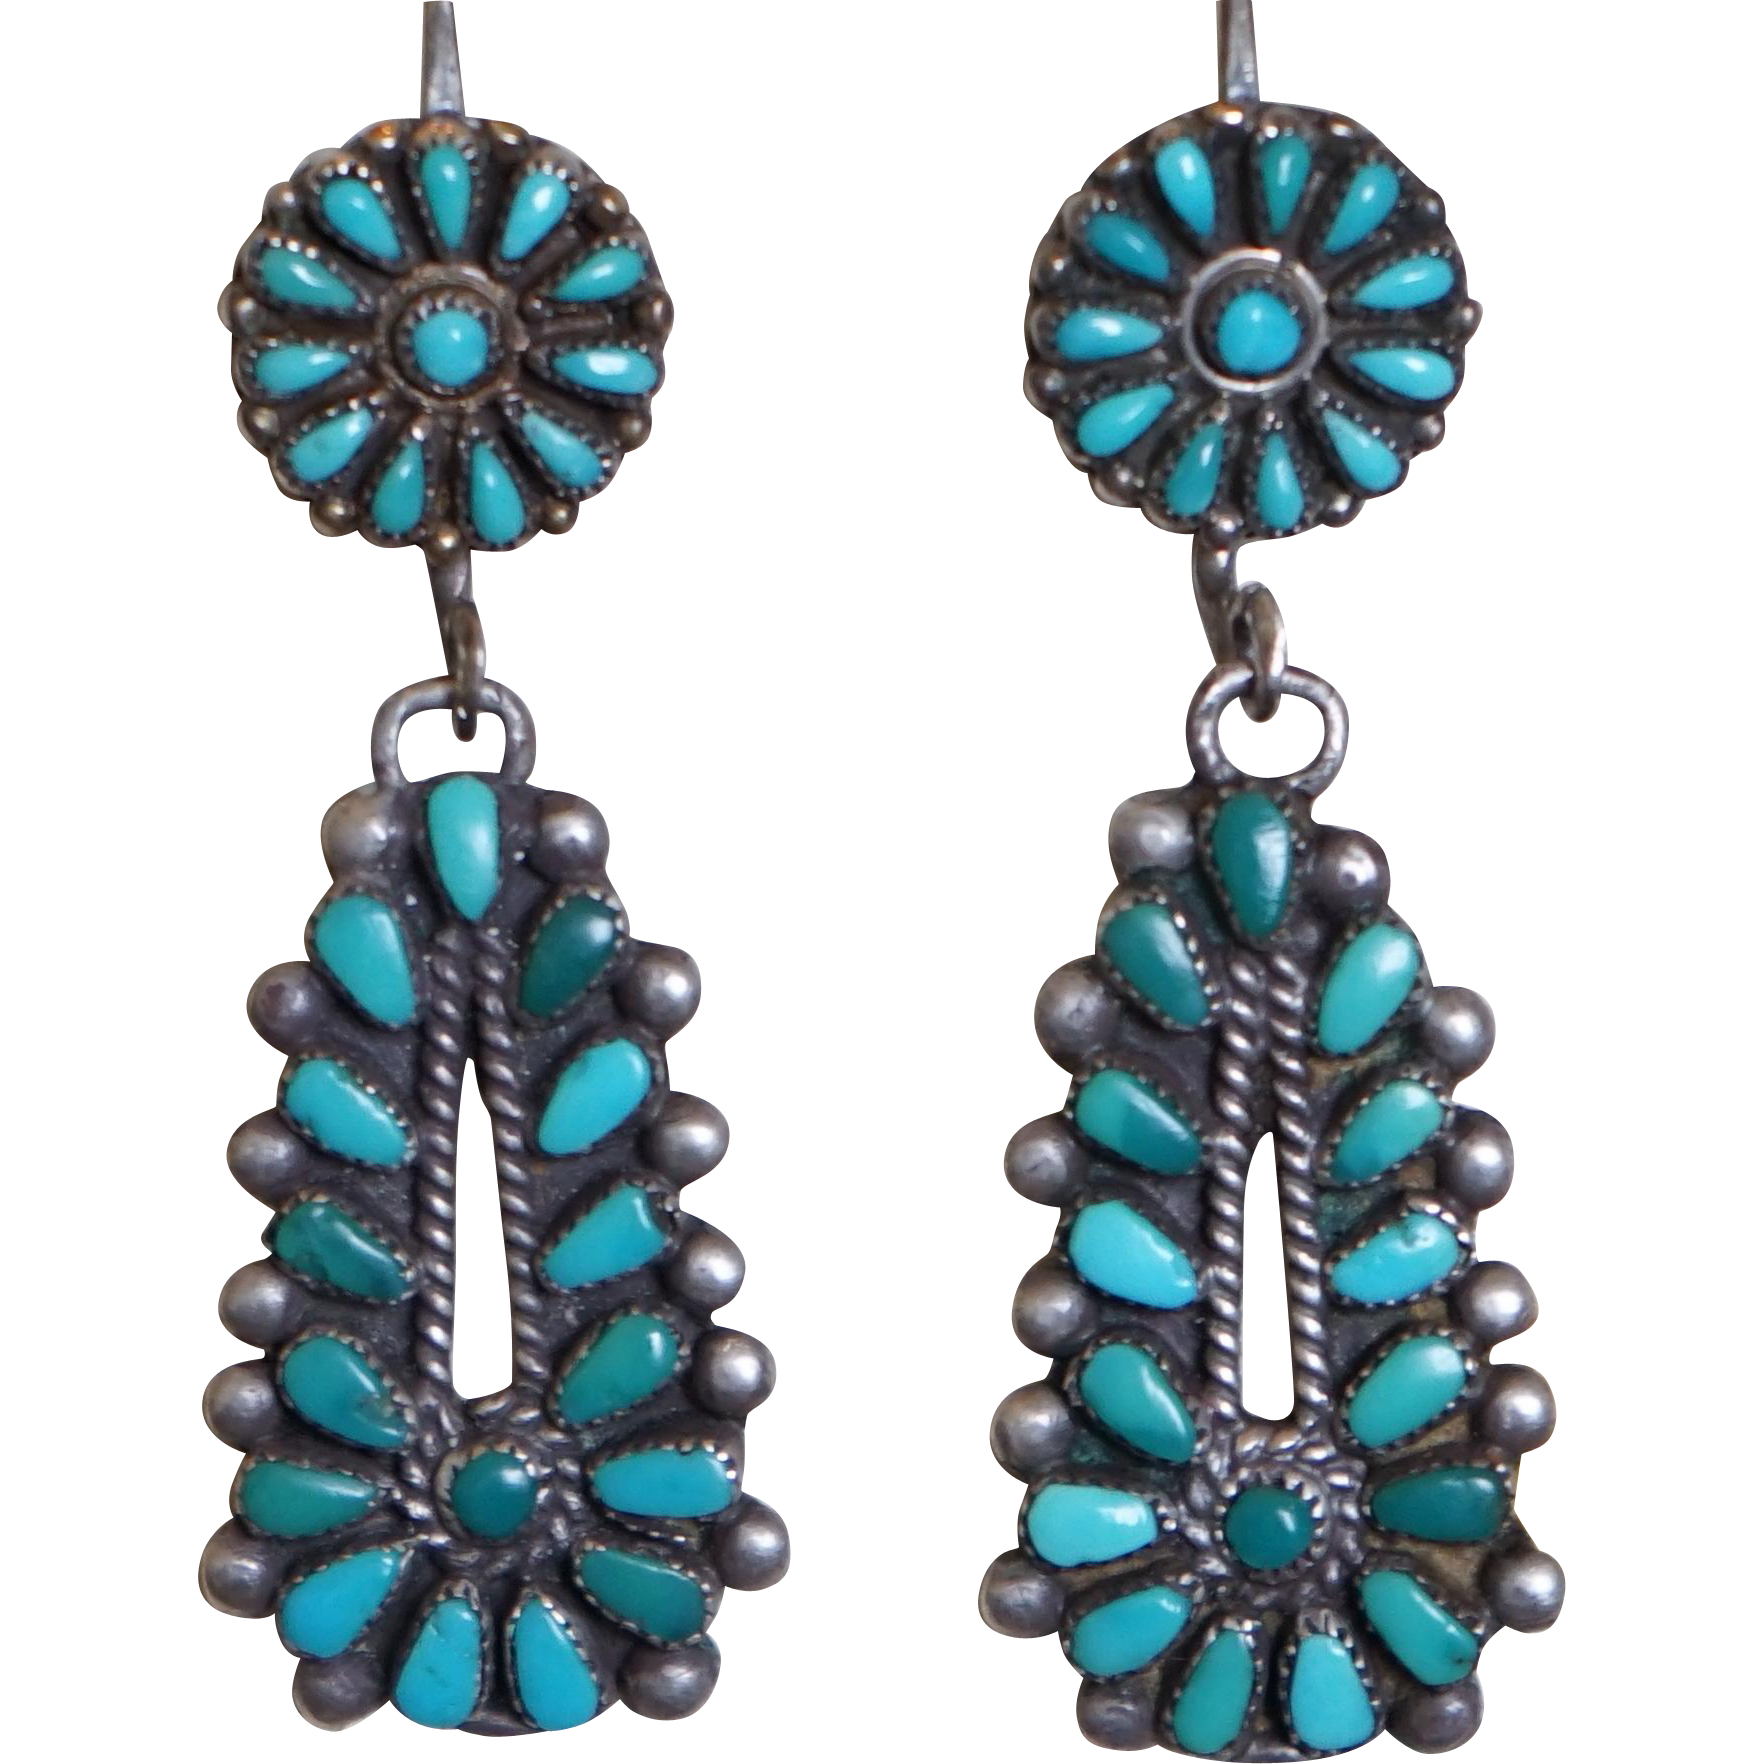 Zuni Earrings: Vintage Zuni Turquoise Earrings From Uchizonogallery On